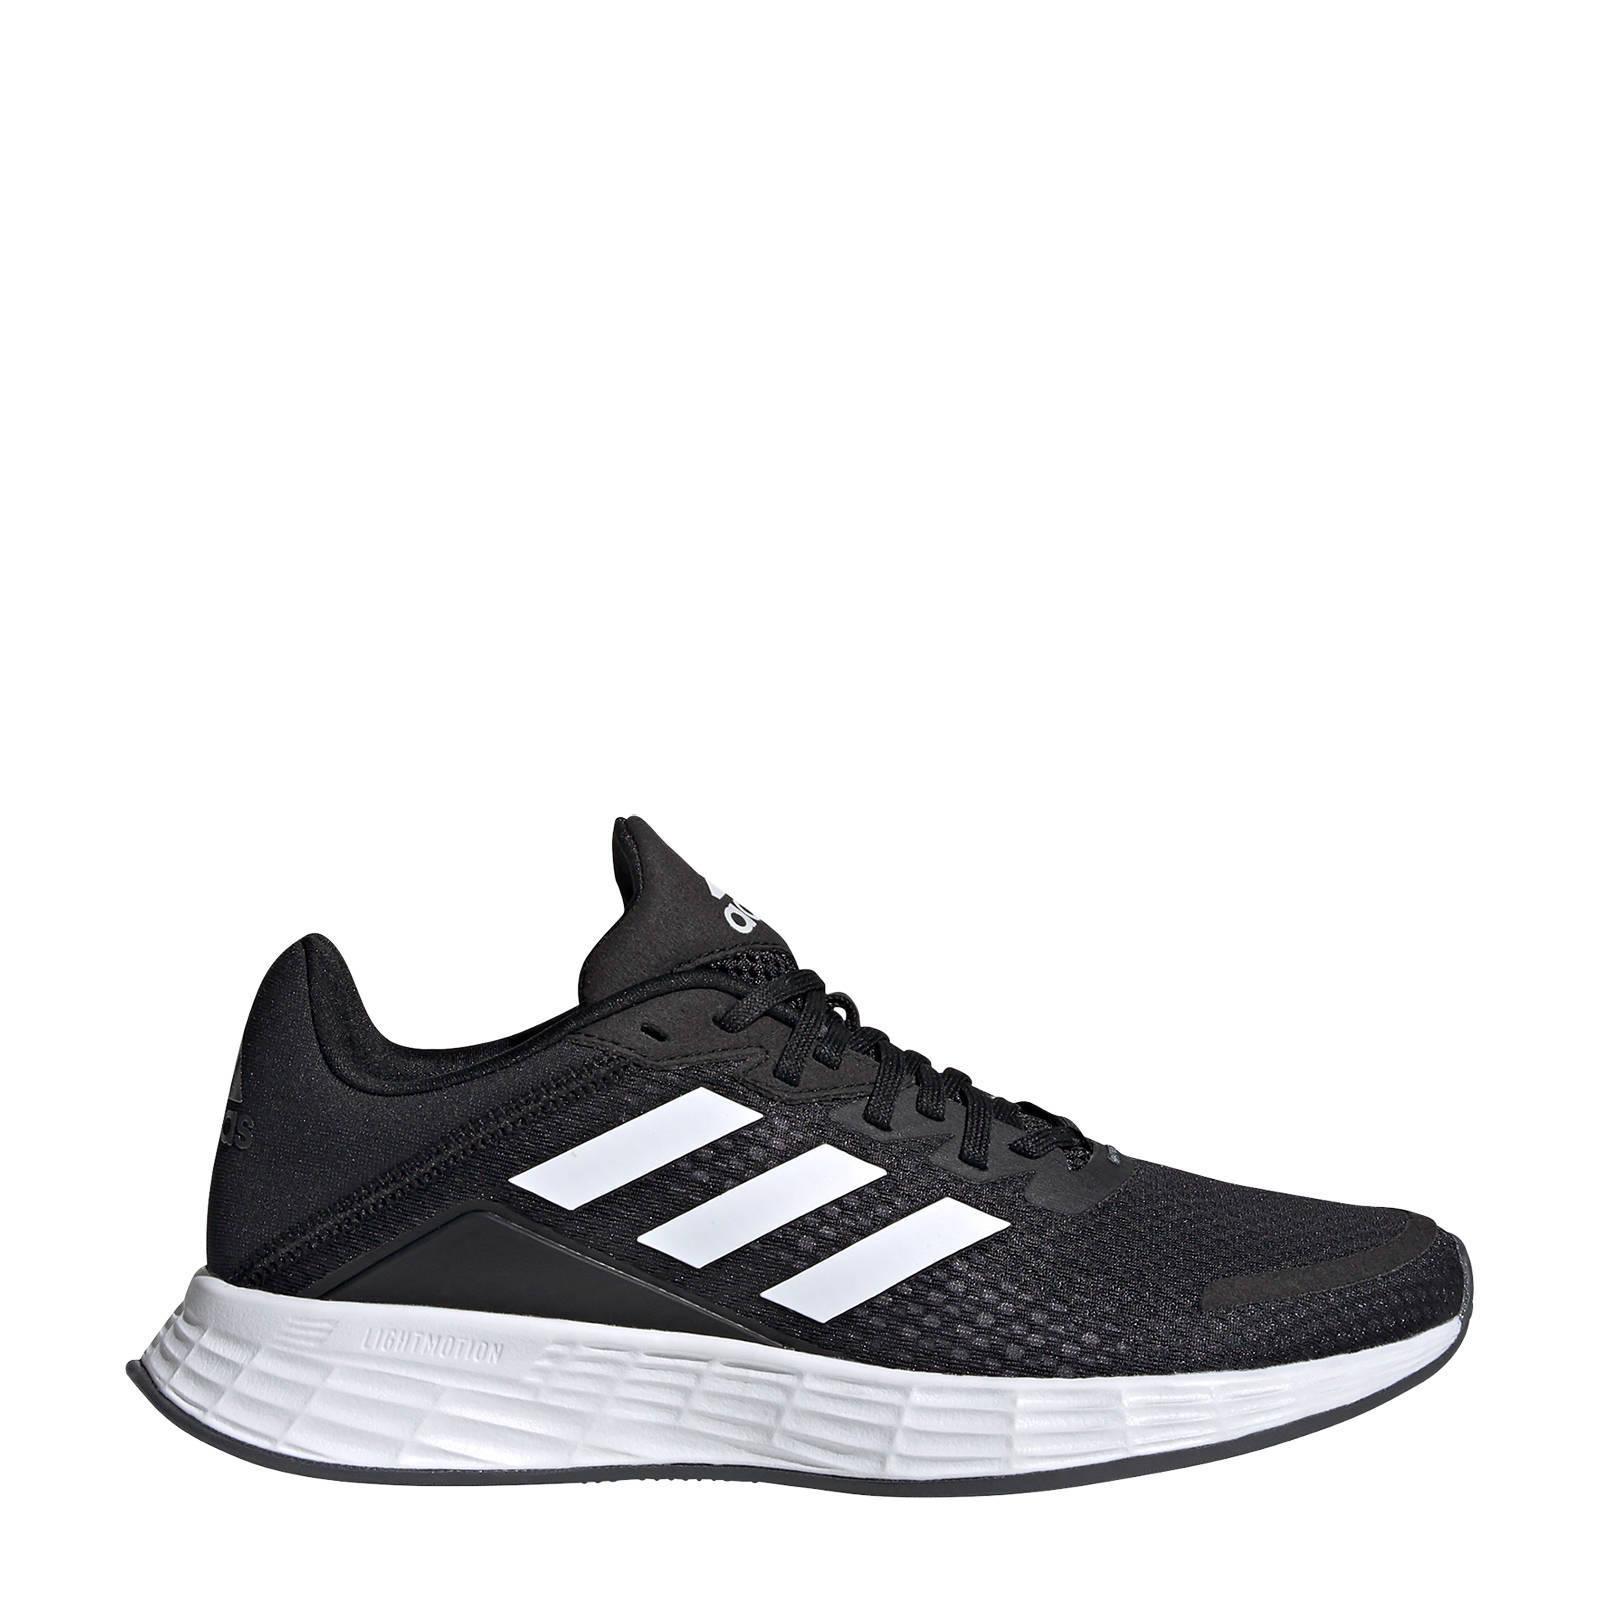 adidas Performance Duramo SL hardloopschoenen zwart/wit ...